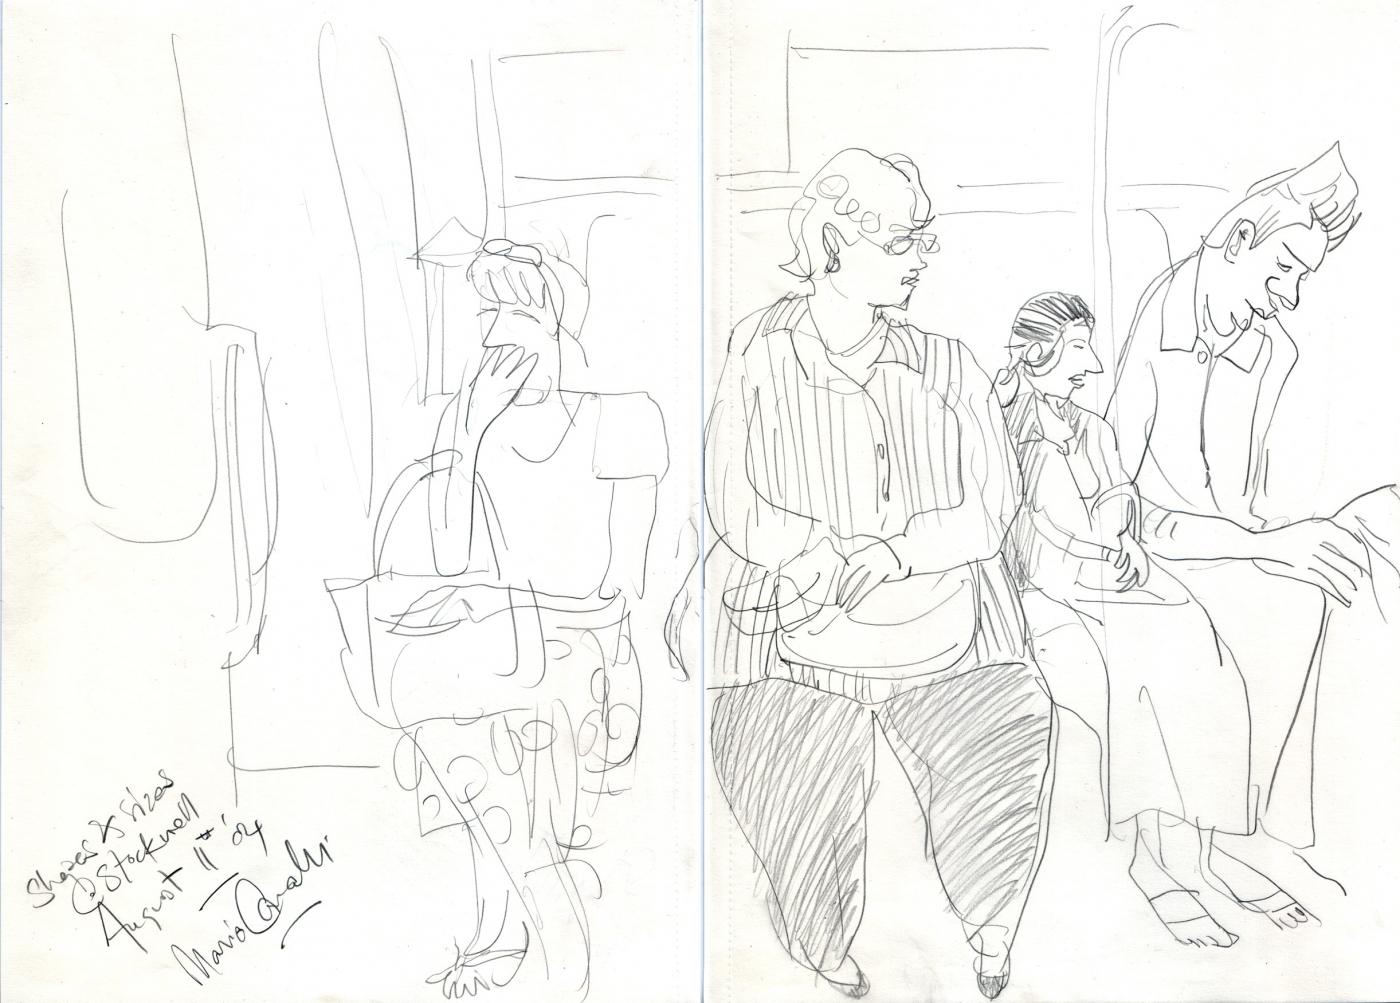 Oscar_sketch_LONDON_PEOPLE_half_adj